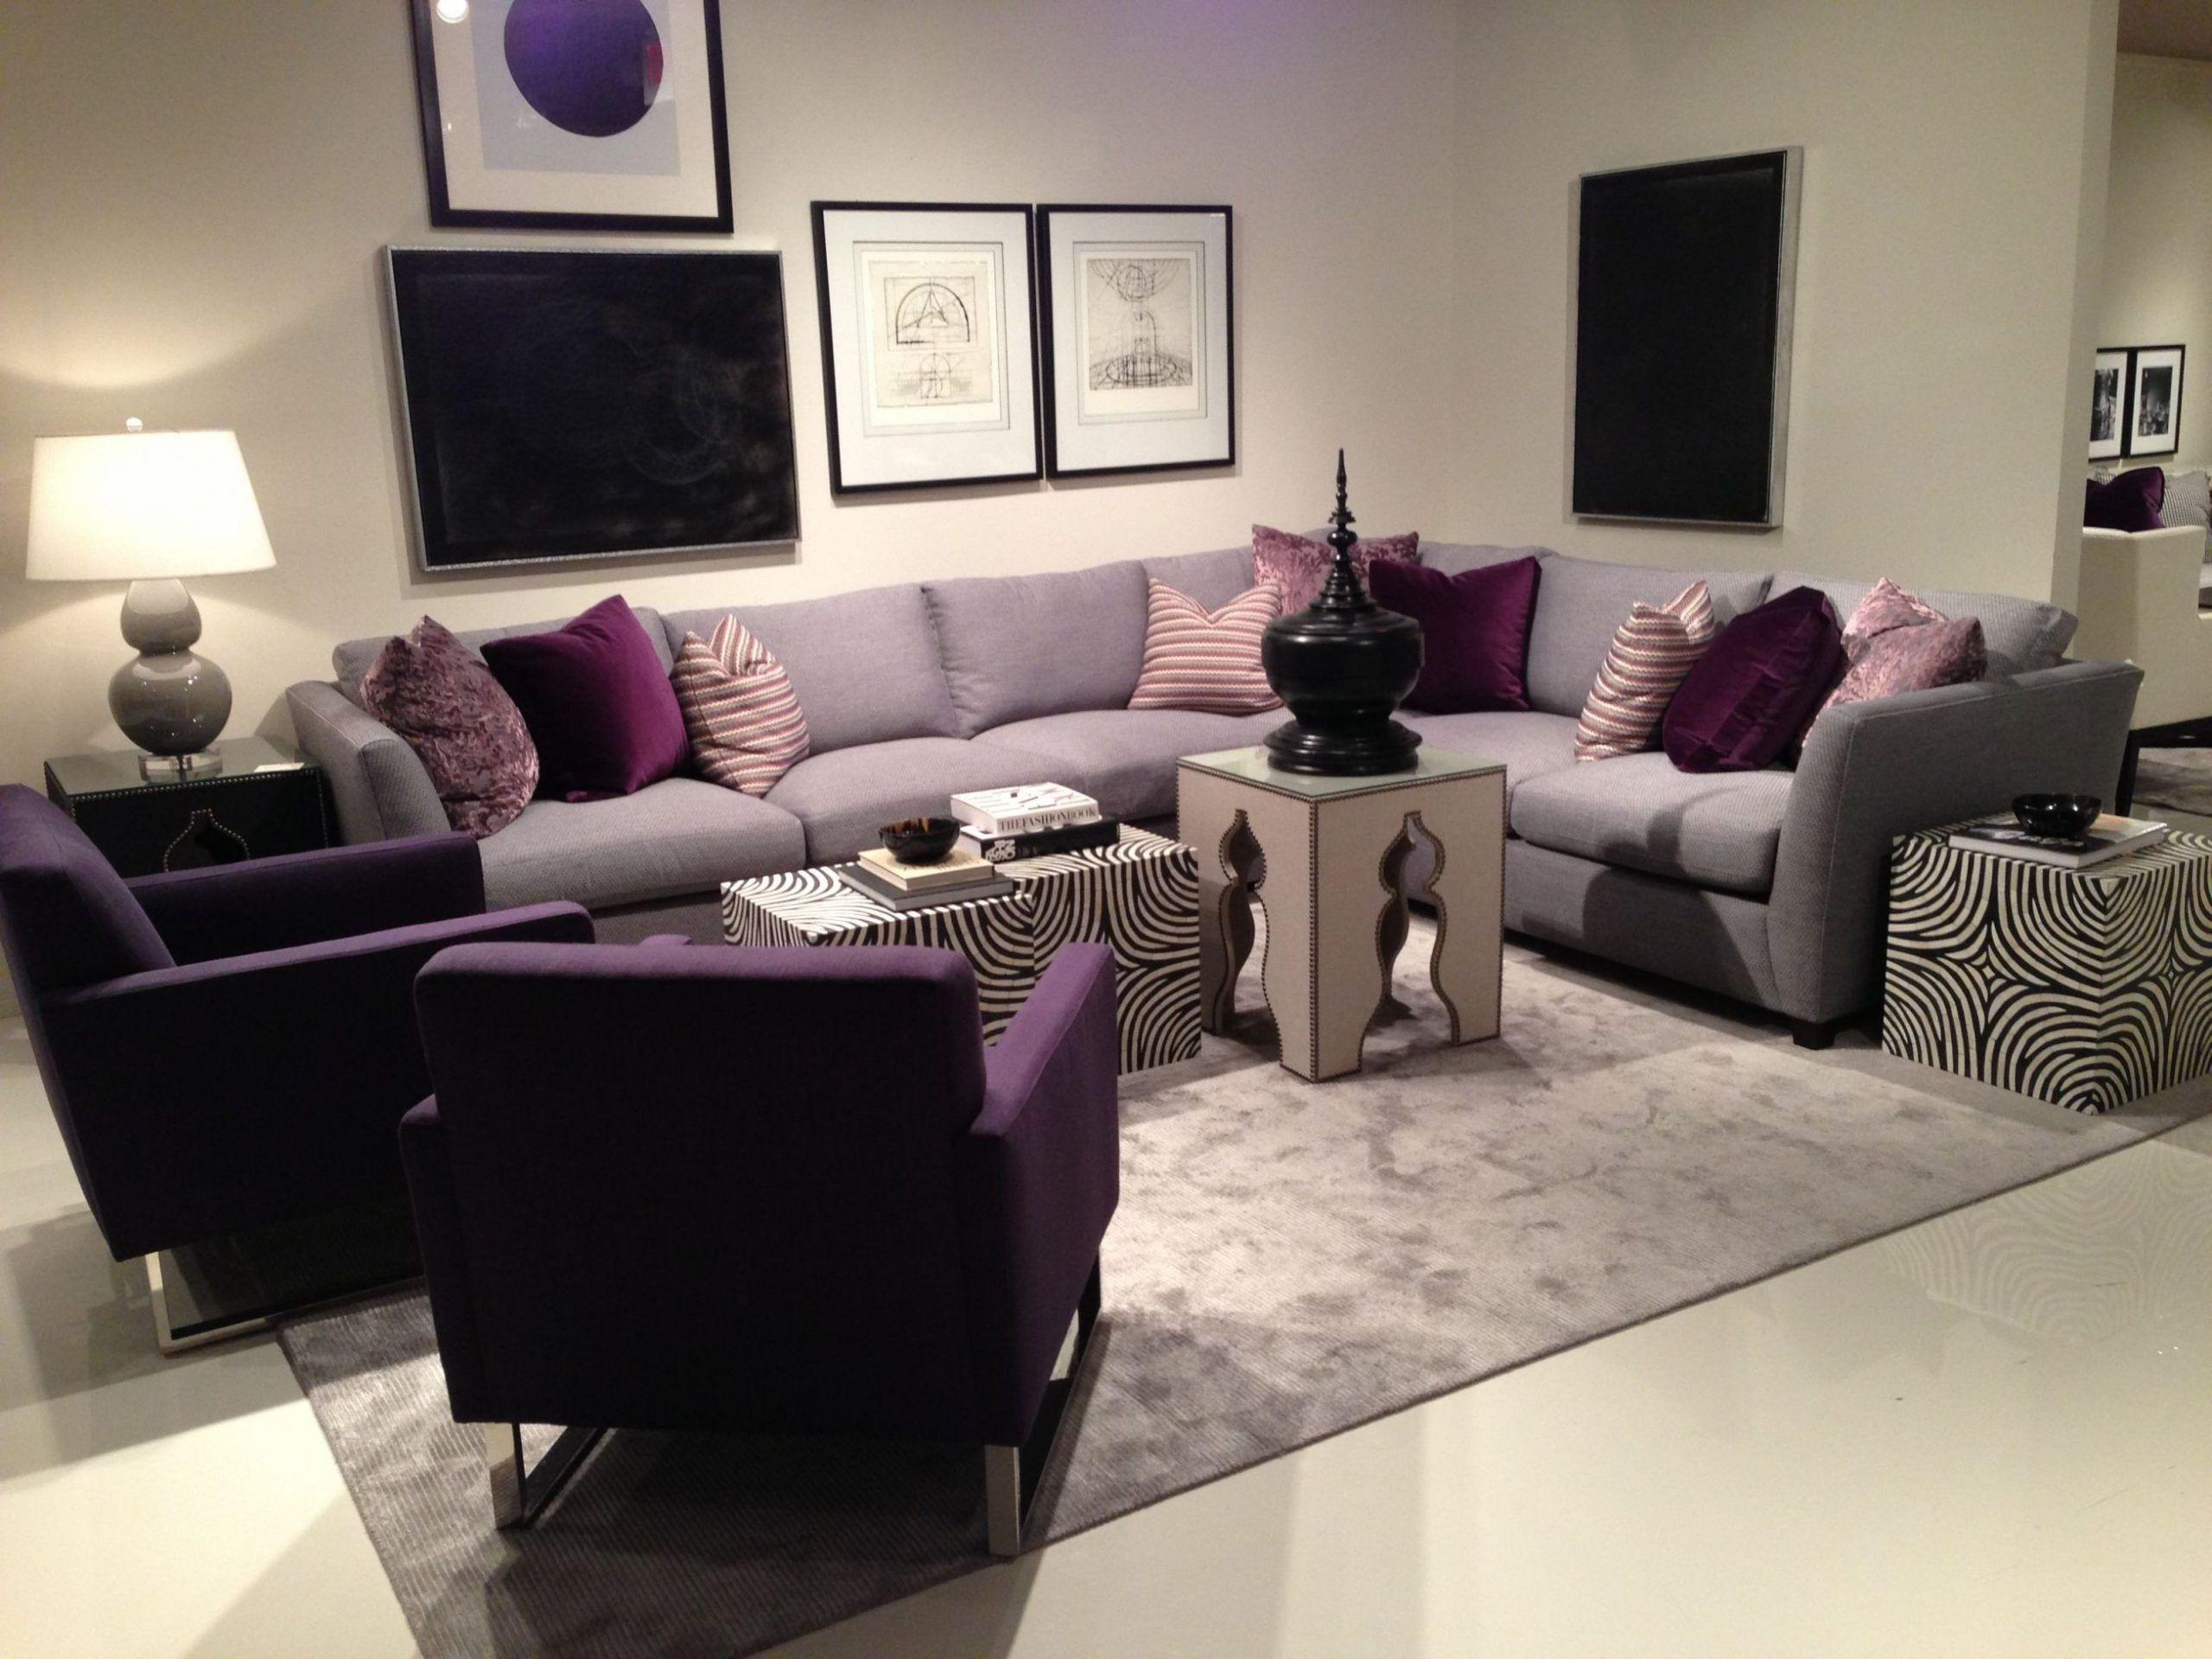 Adorable Purple Living Room Decor In 2021 Purple Living Room Living Room Decor Gray Grey Sofa Living Room